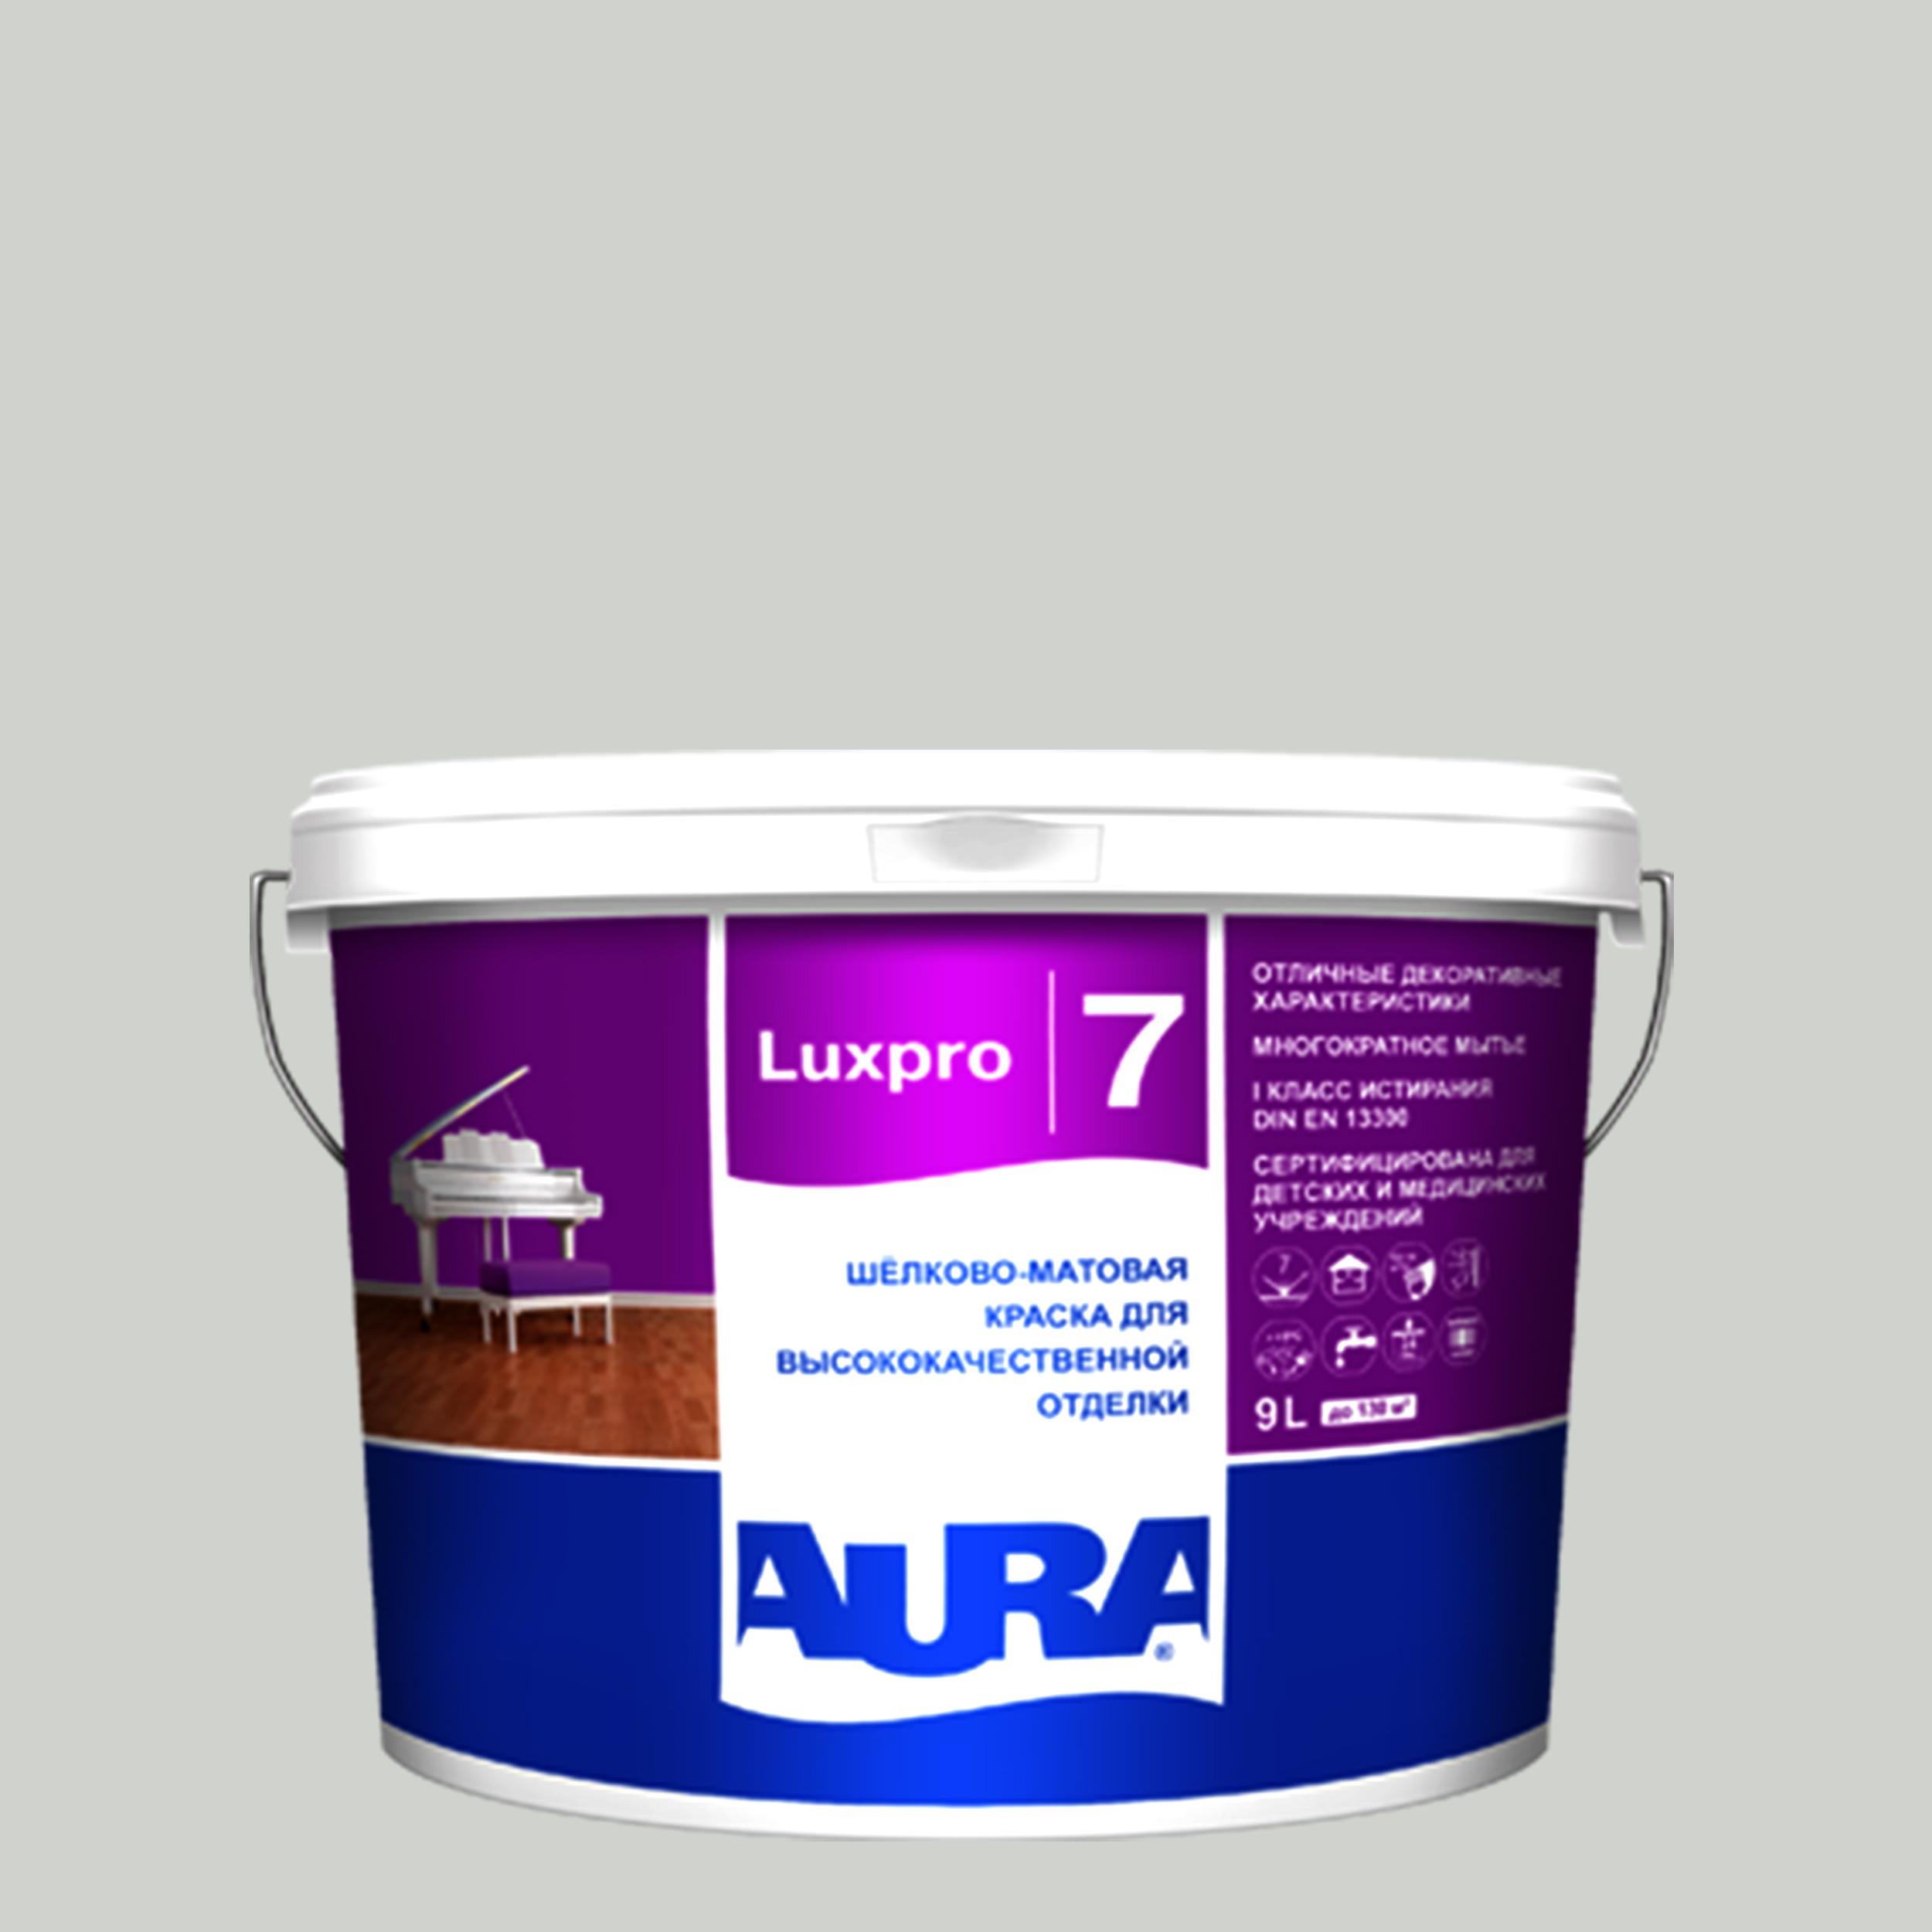 Фото 5 - Краска интерьерная, Aura LuxPRO 7, RAL 3005, 11 кг.